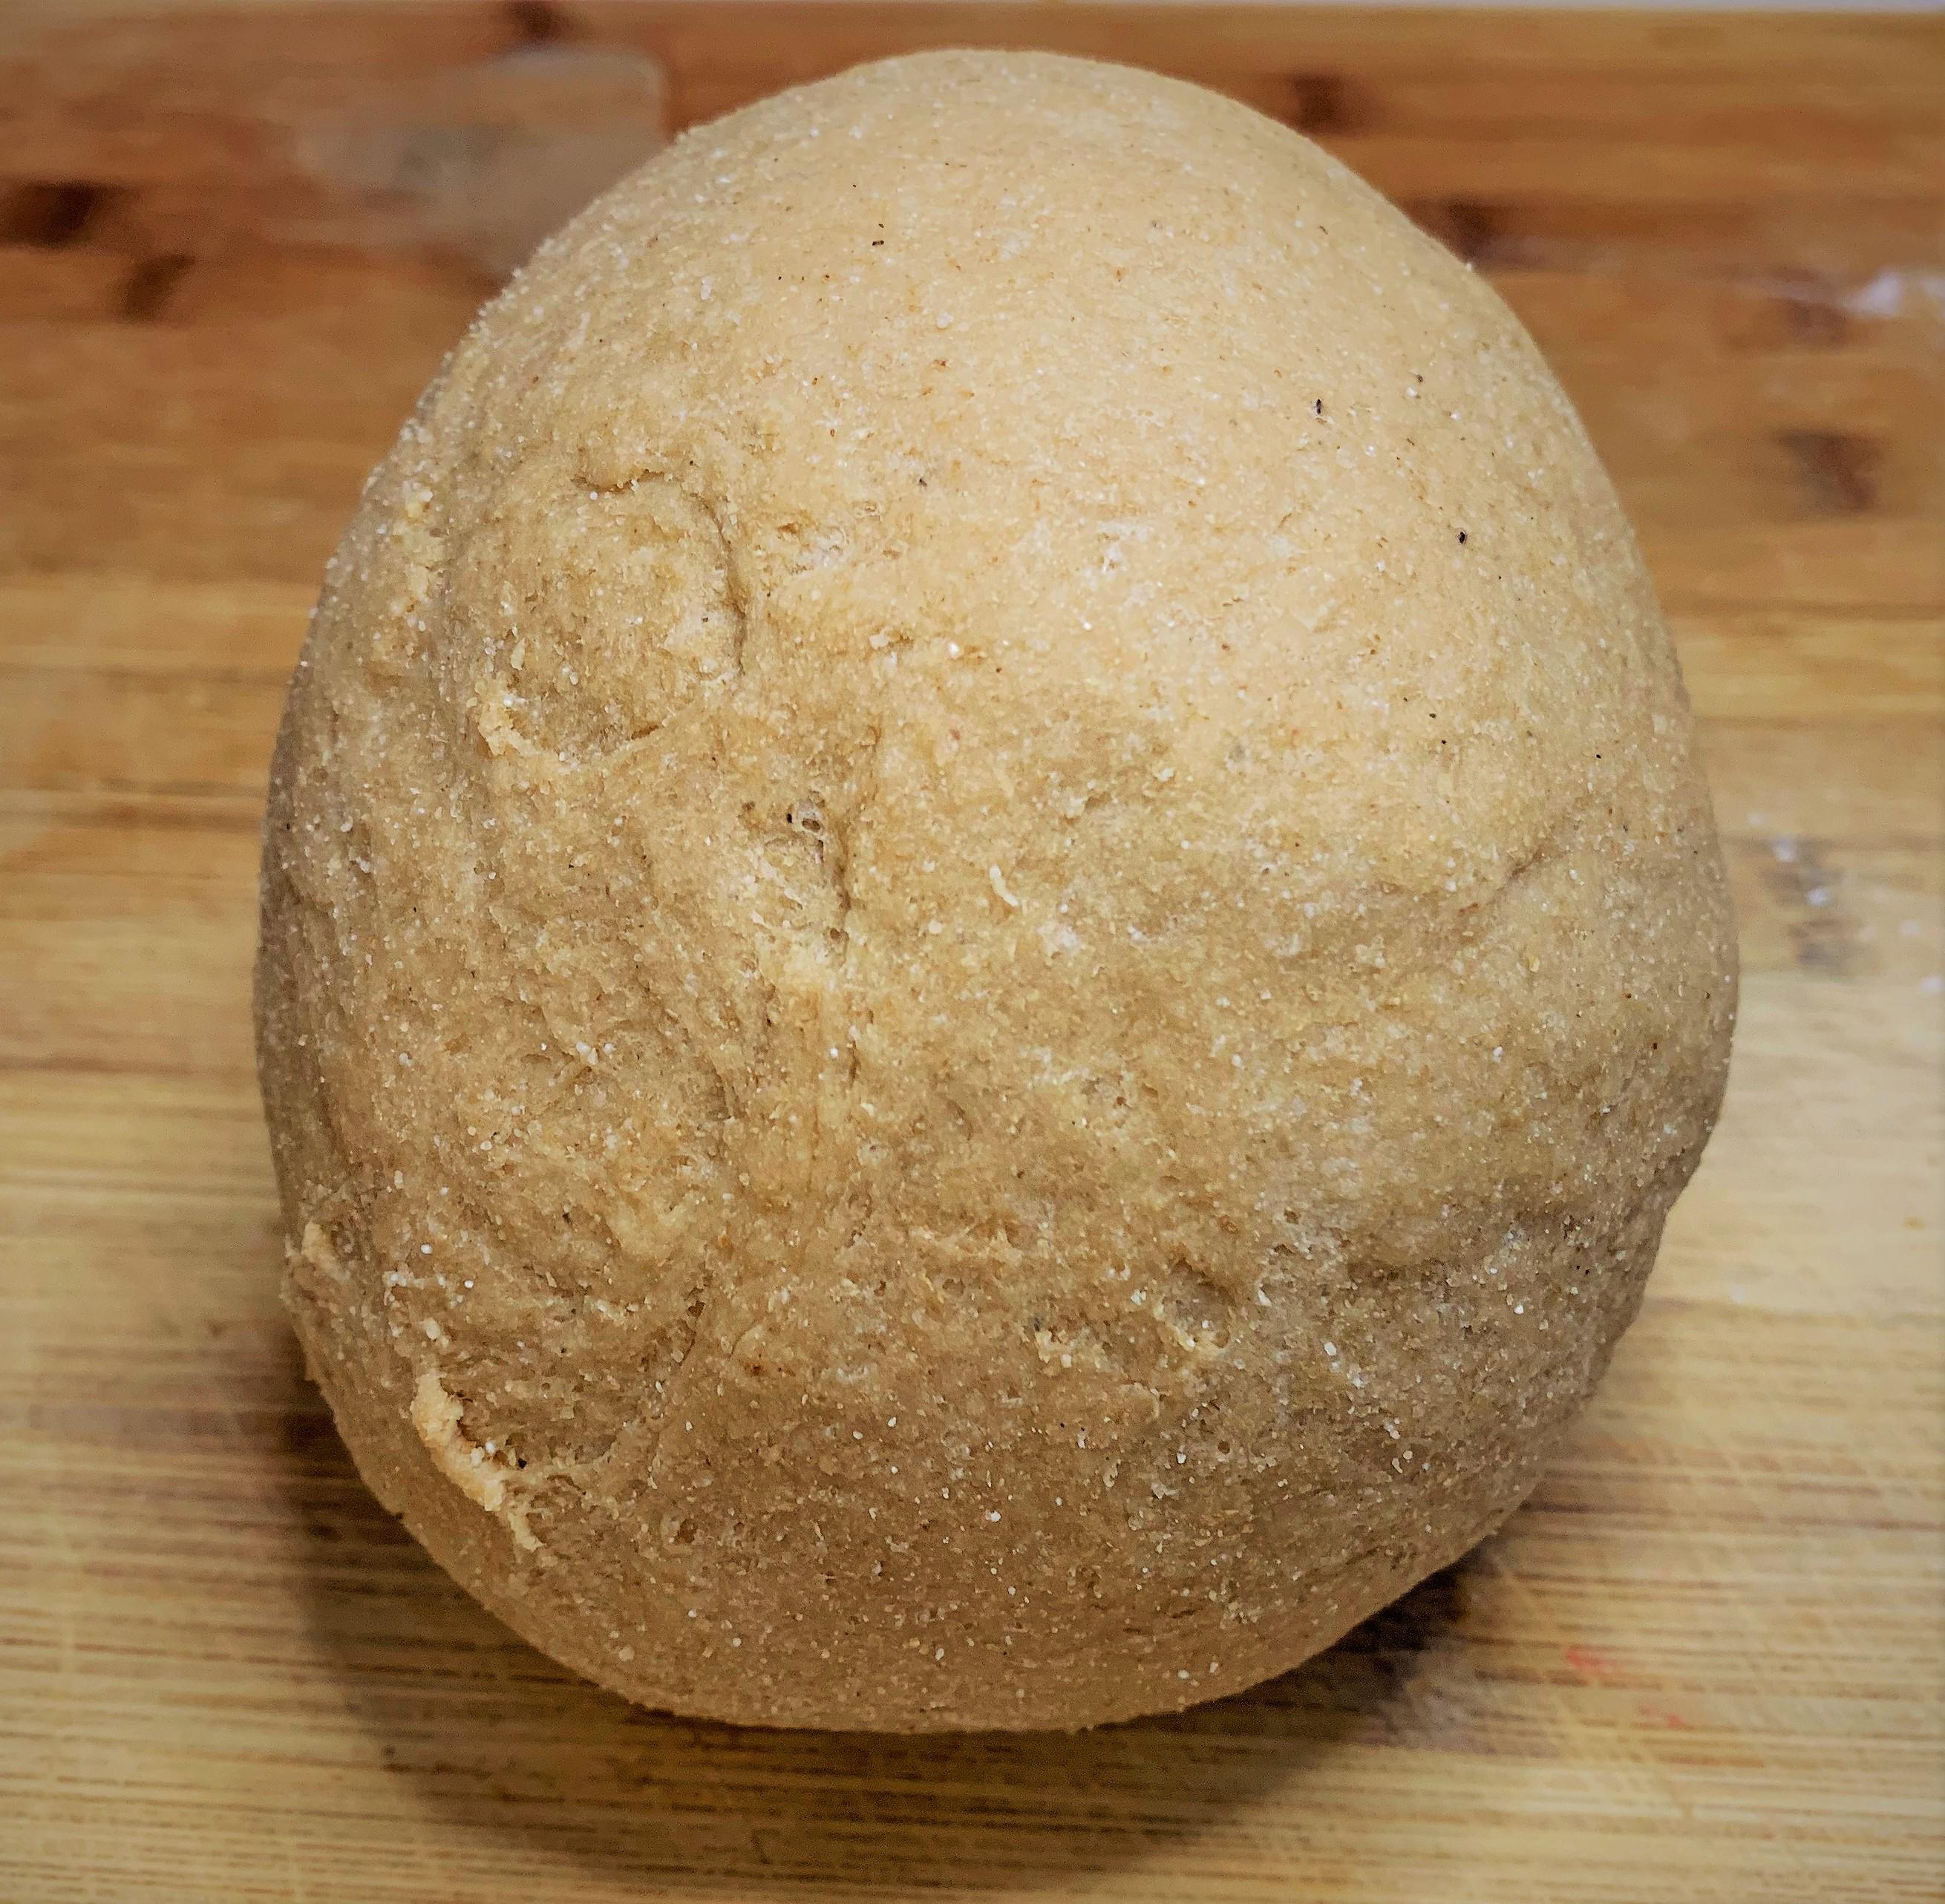 Our kneaded dough